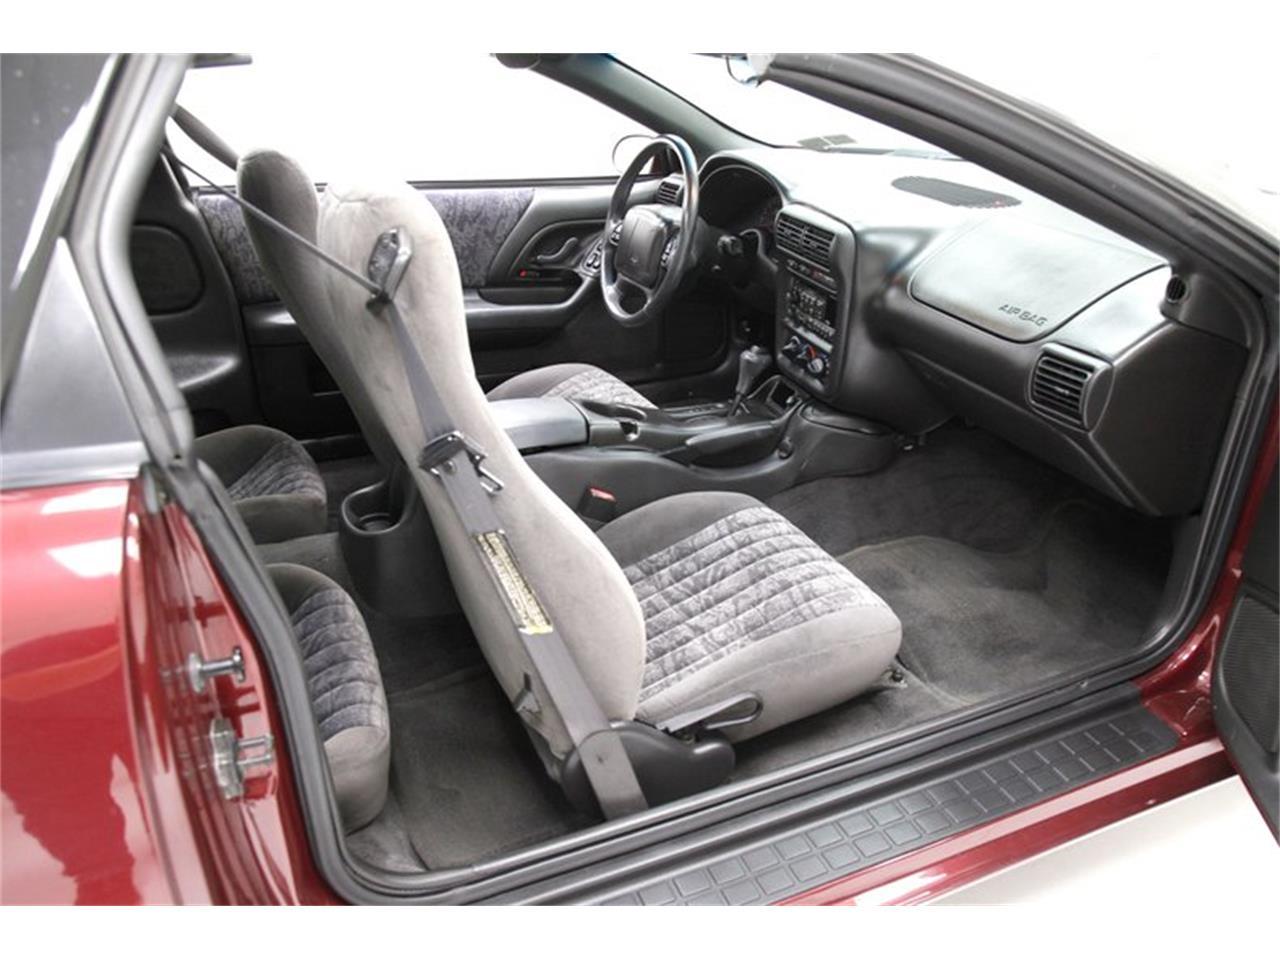 2002 Chevrolet Camaro (CC-1383486) for sale in Morgantown, Pennsylvania